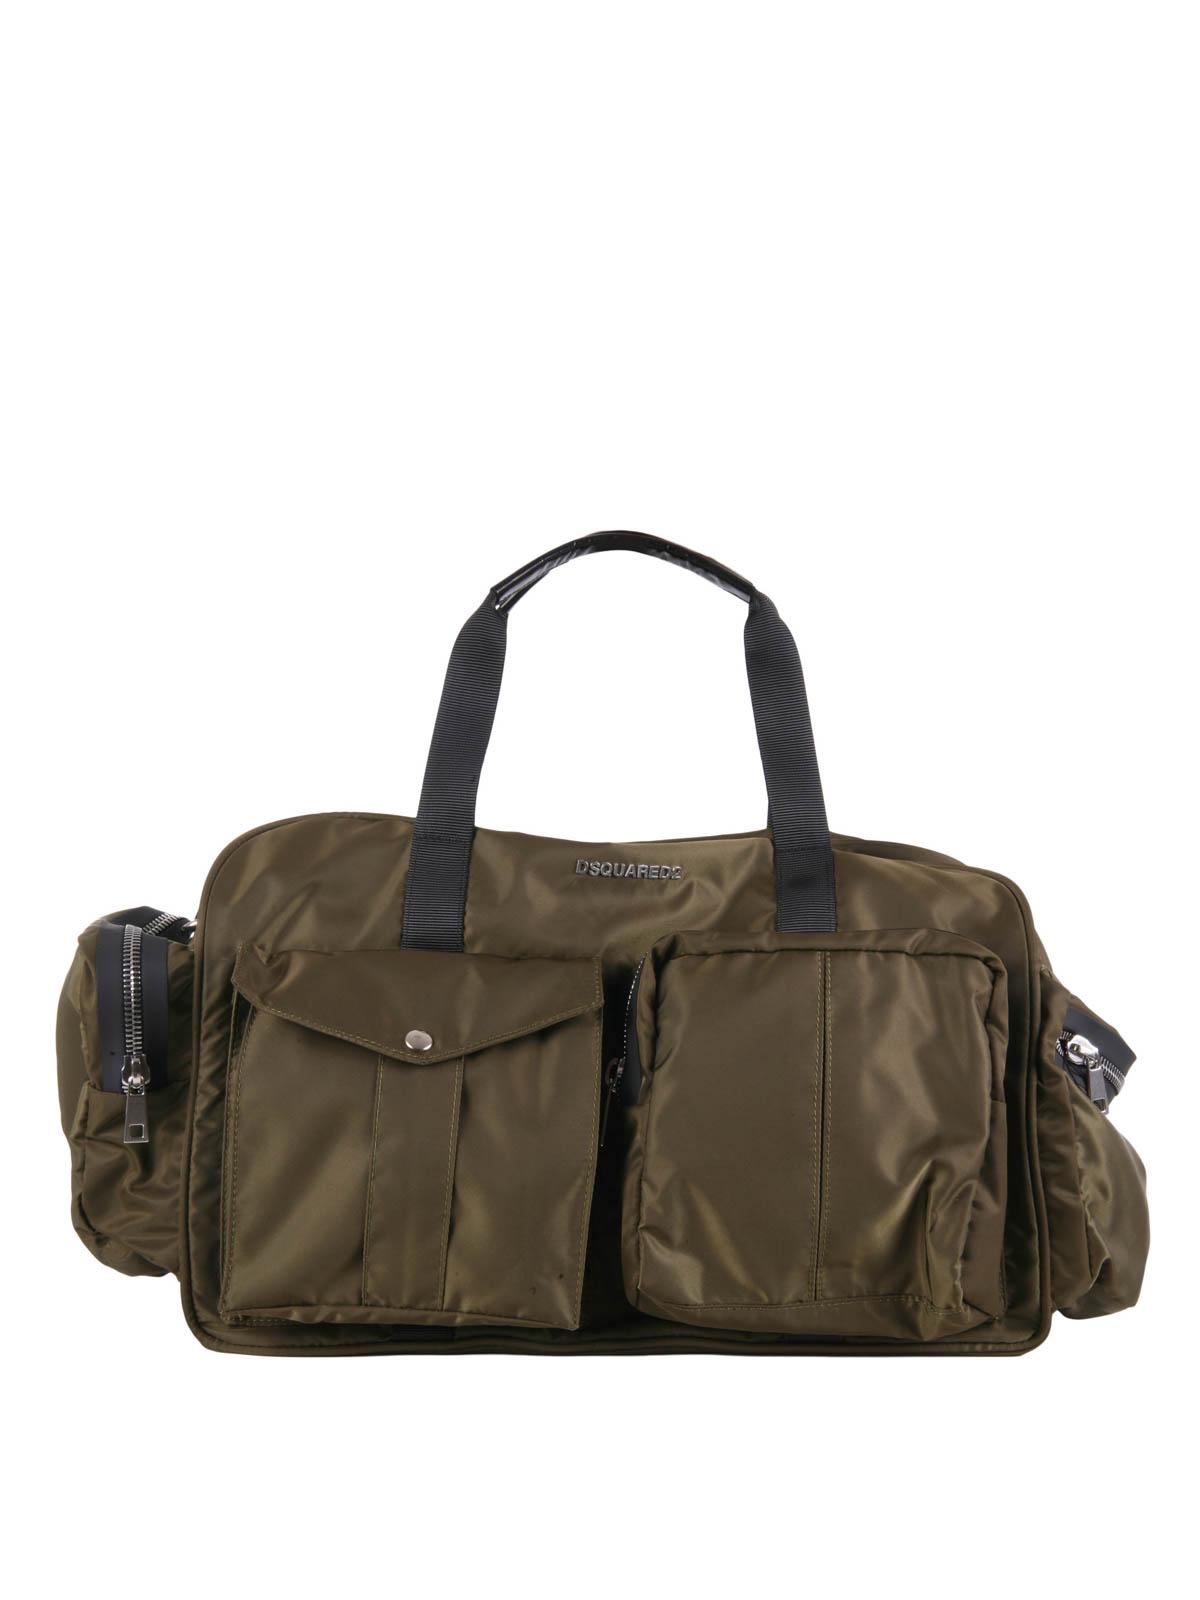 e8e197e6ad87 Dsquared2 - Utility duffle bag - sport bags - W16DF4015 8066